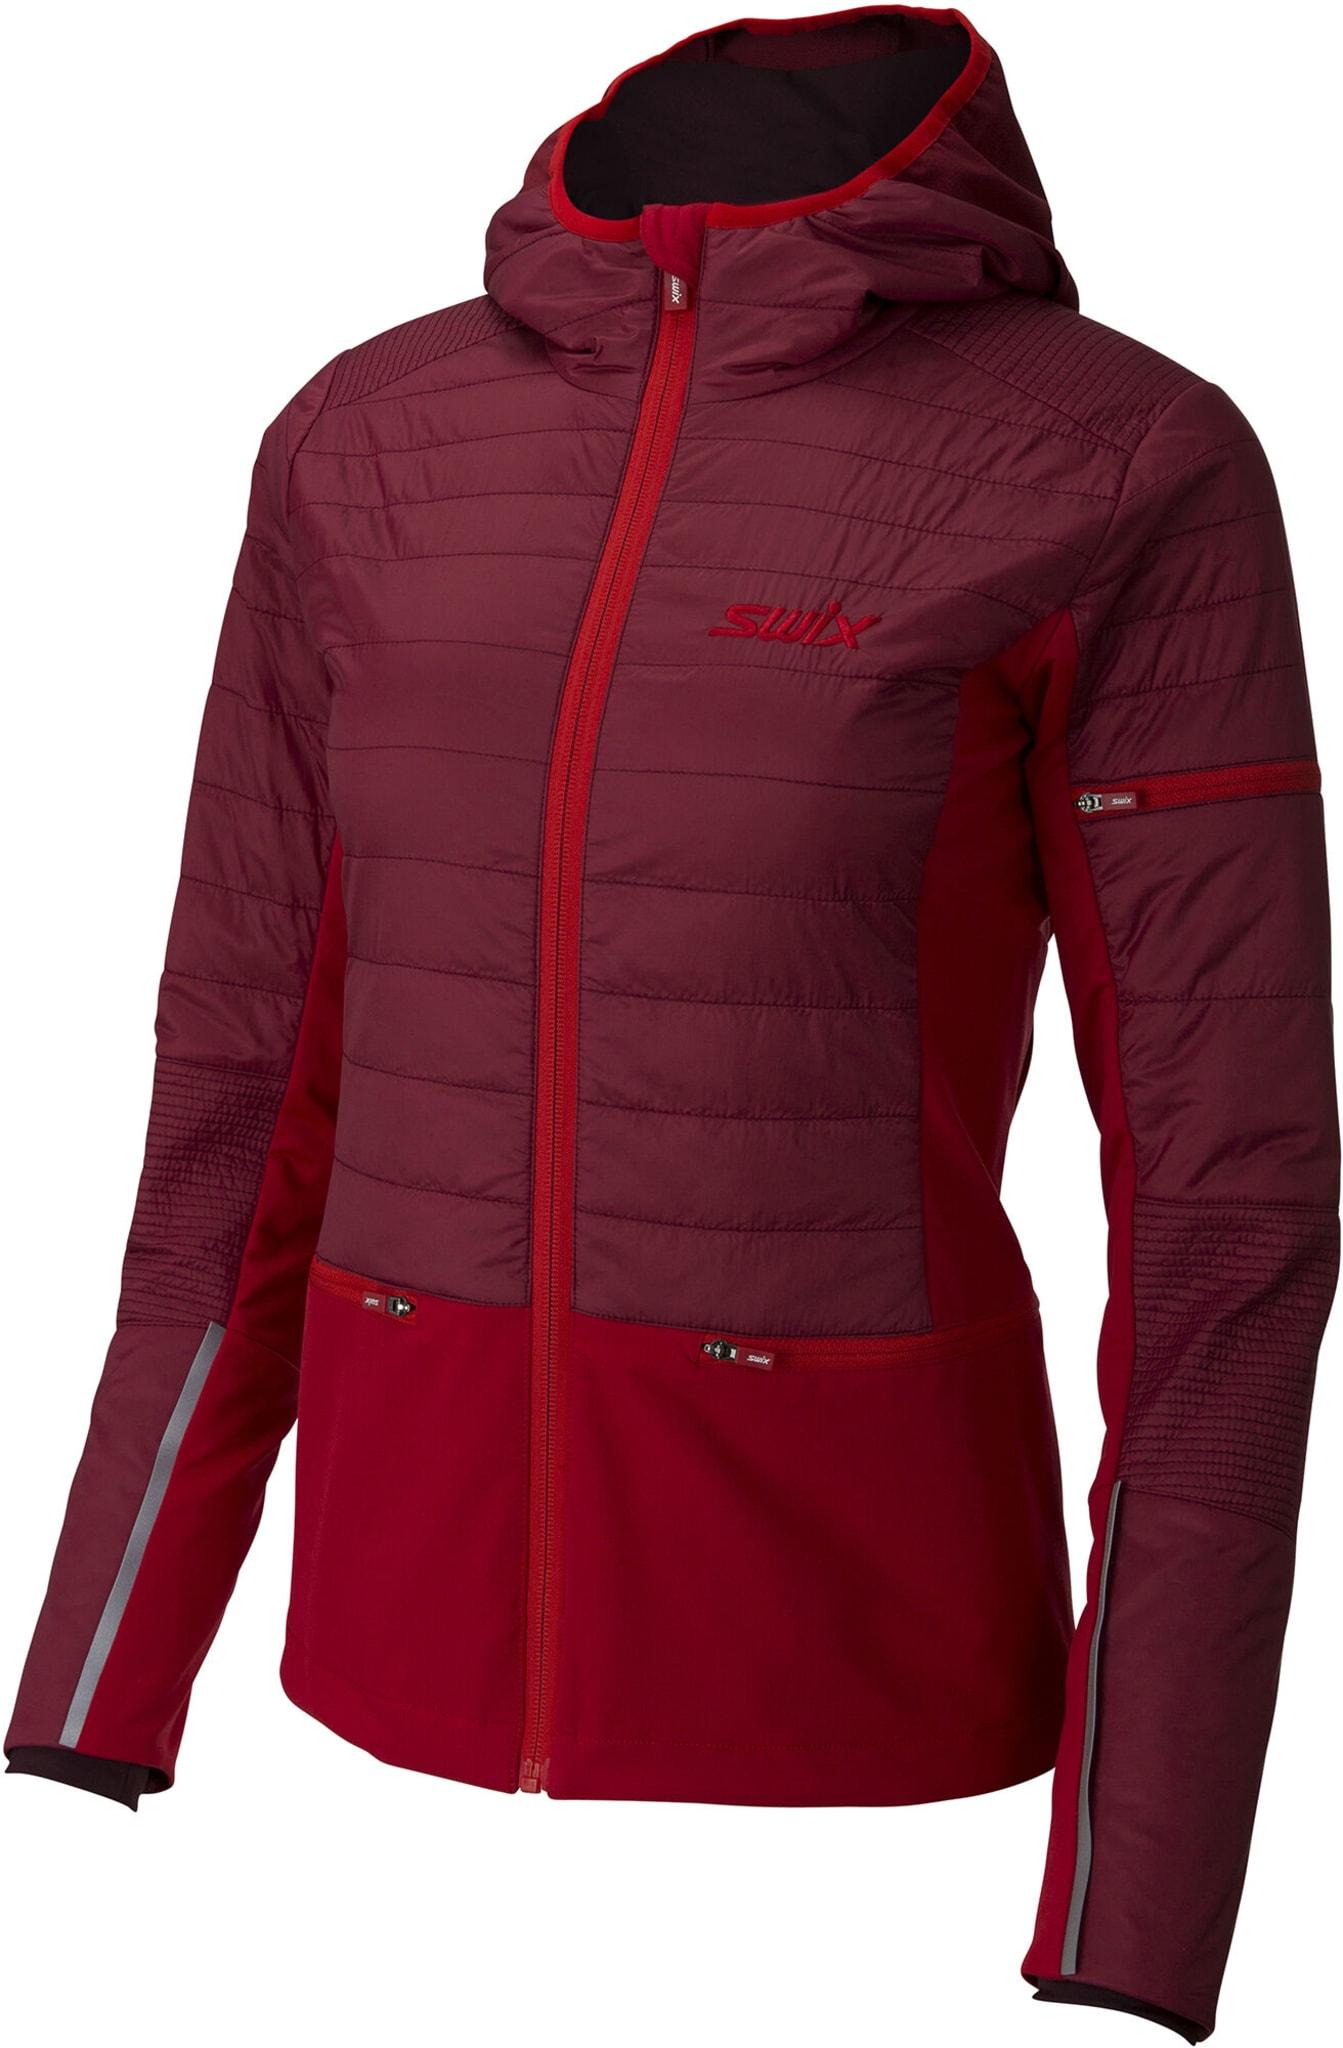 Horizon Jacket W